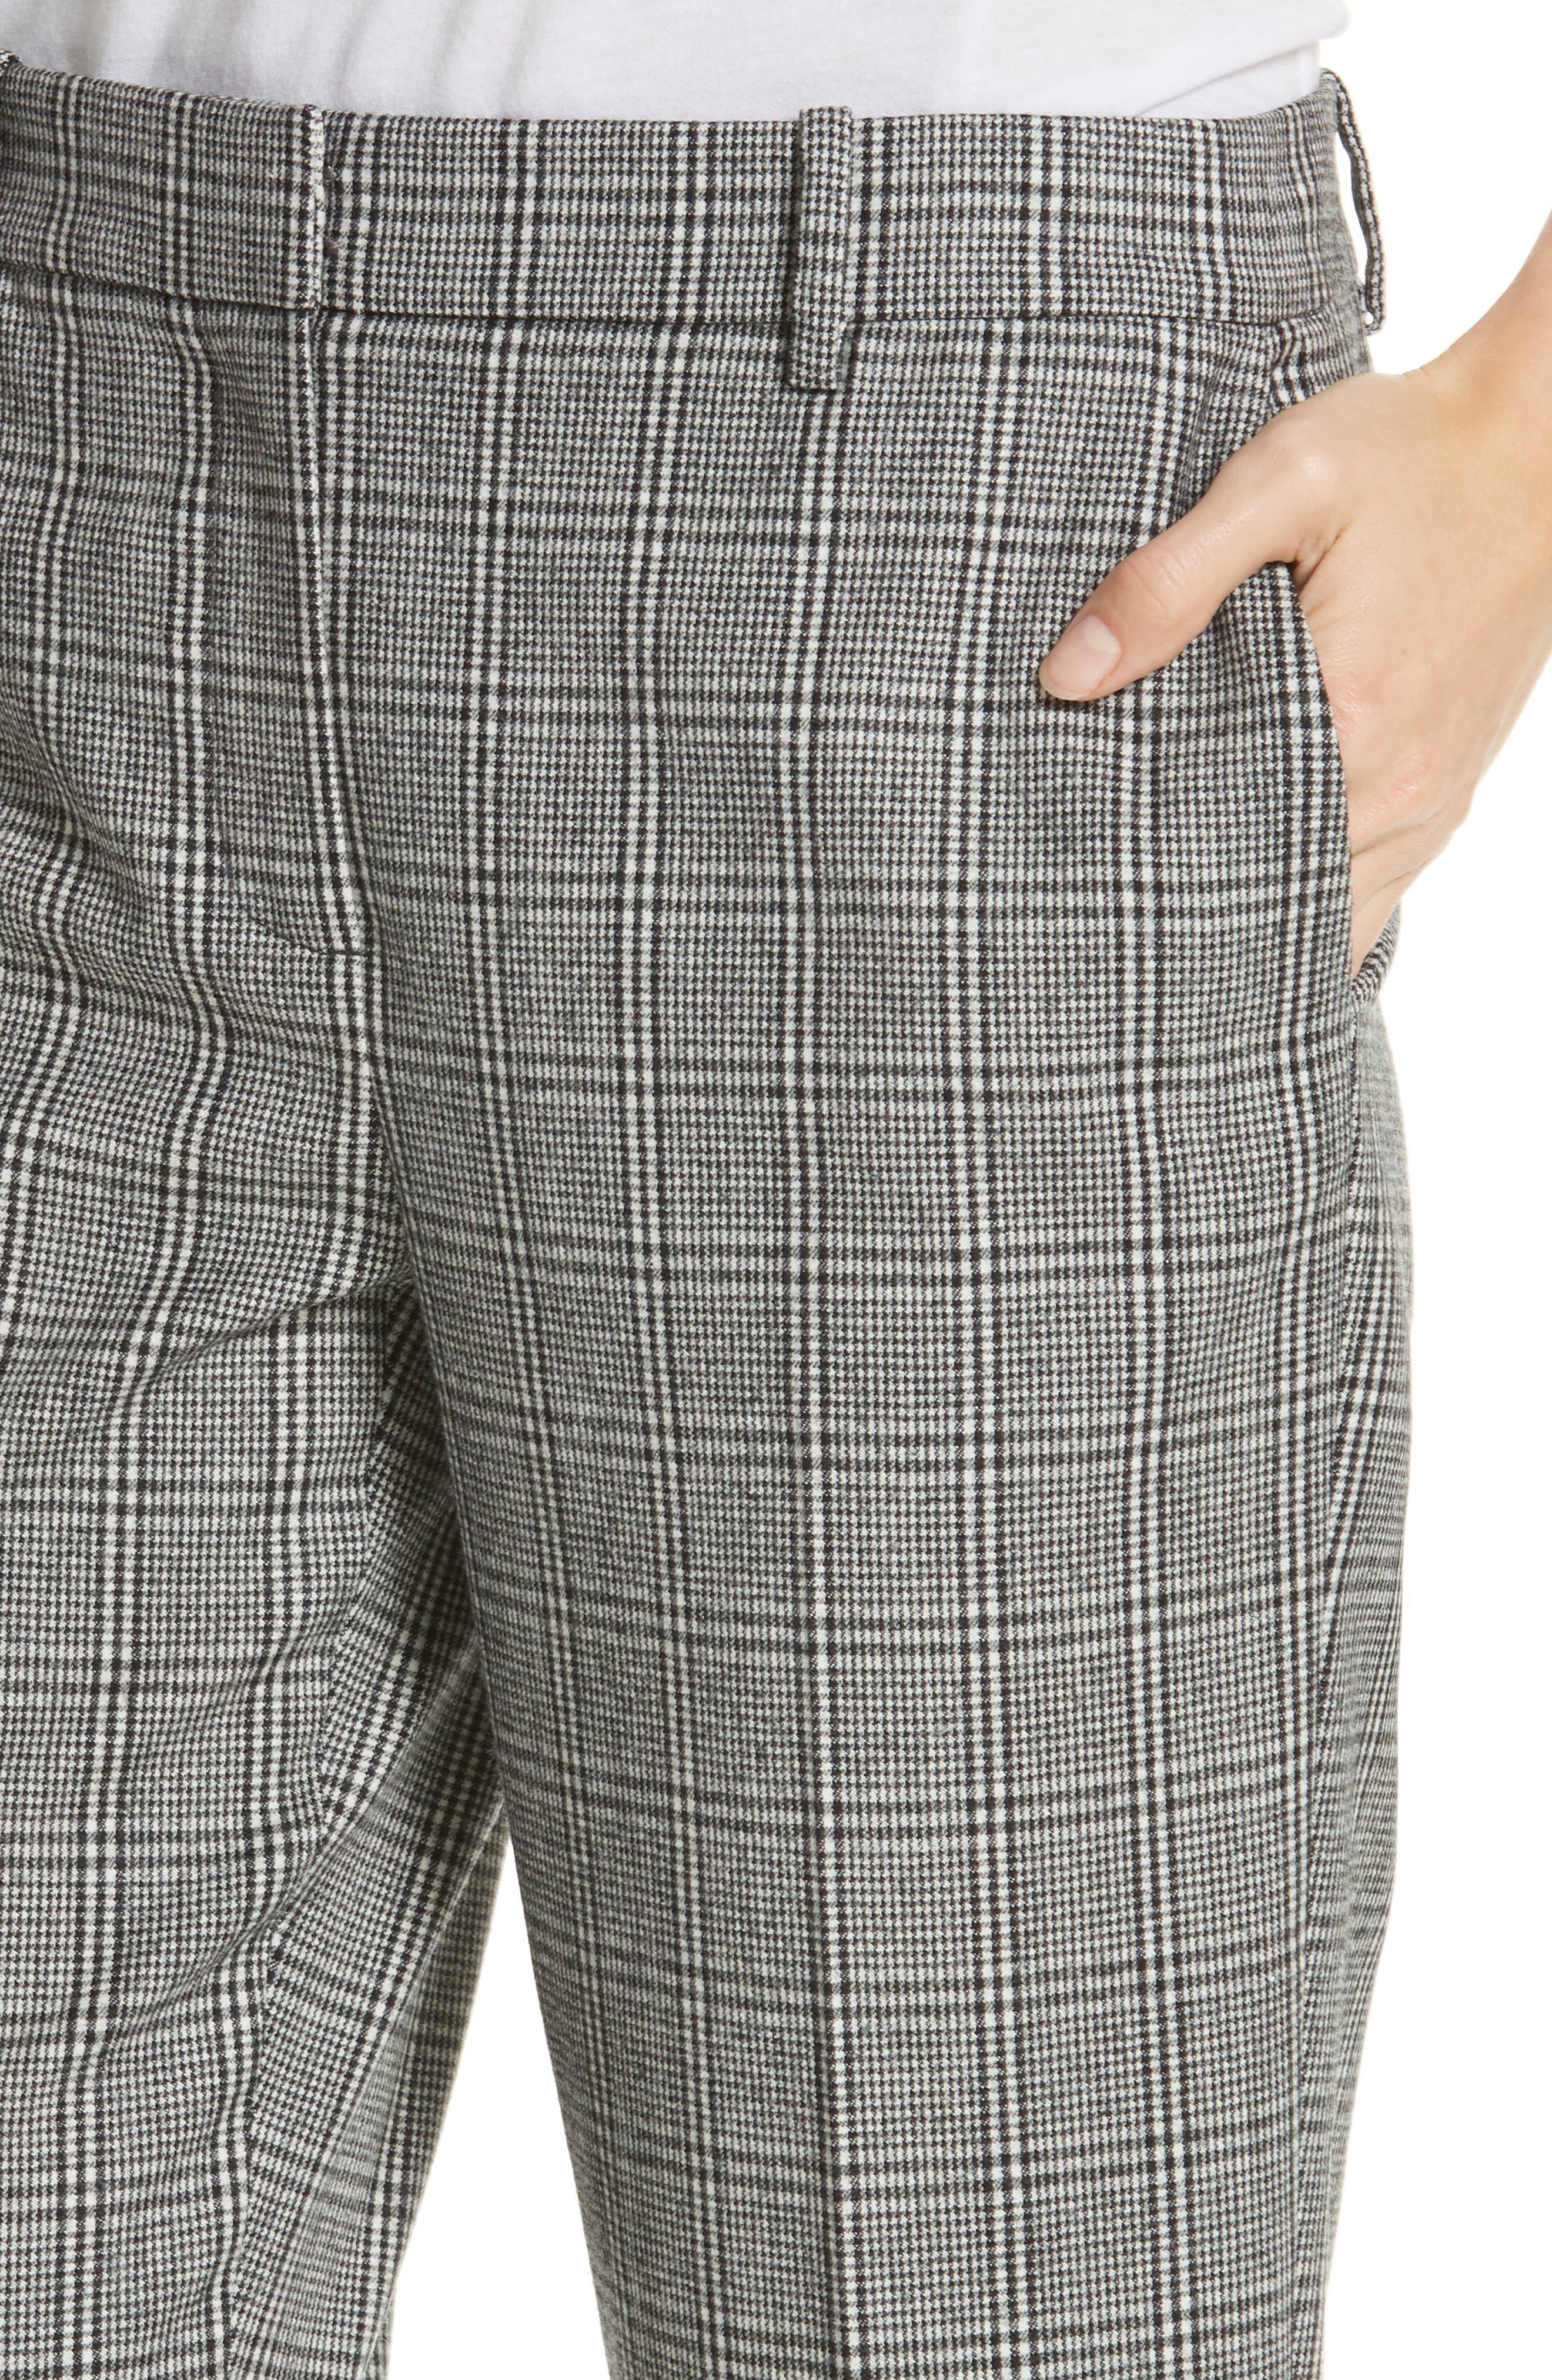 Check Crop Pants,                             Alternate thumbnail 4, color,                             BLACK- WHITE ELODIE CHECK